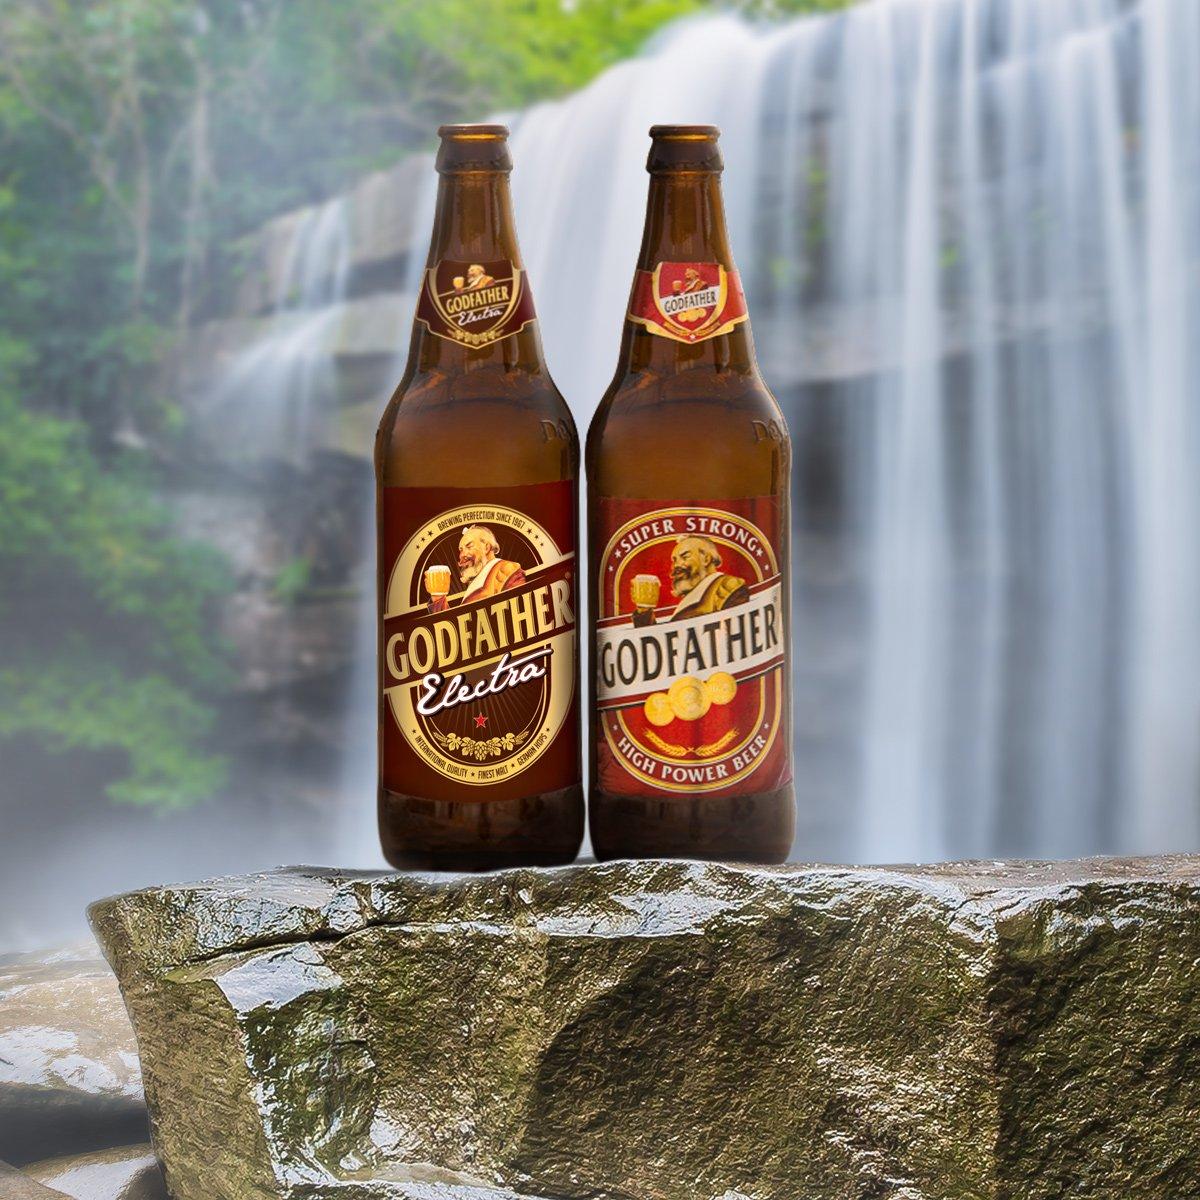 beer_brands_india_under_rs_200_godfather_image